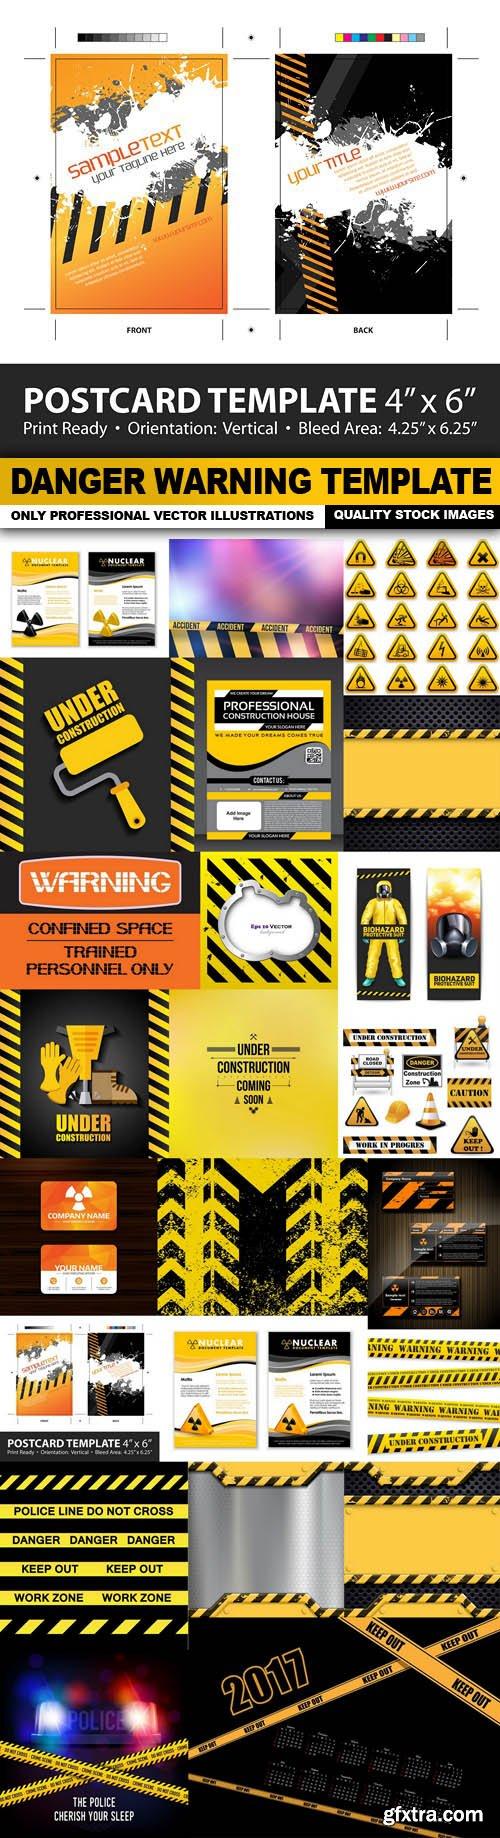 Danger Warning Template - 24 Vector